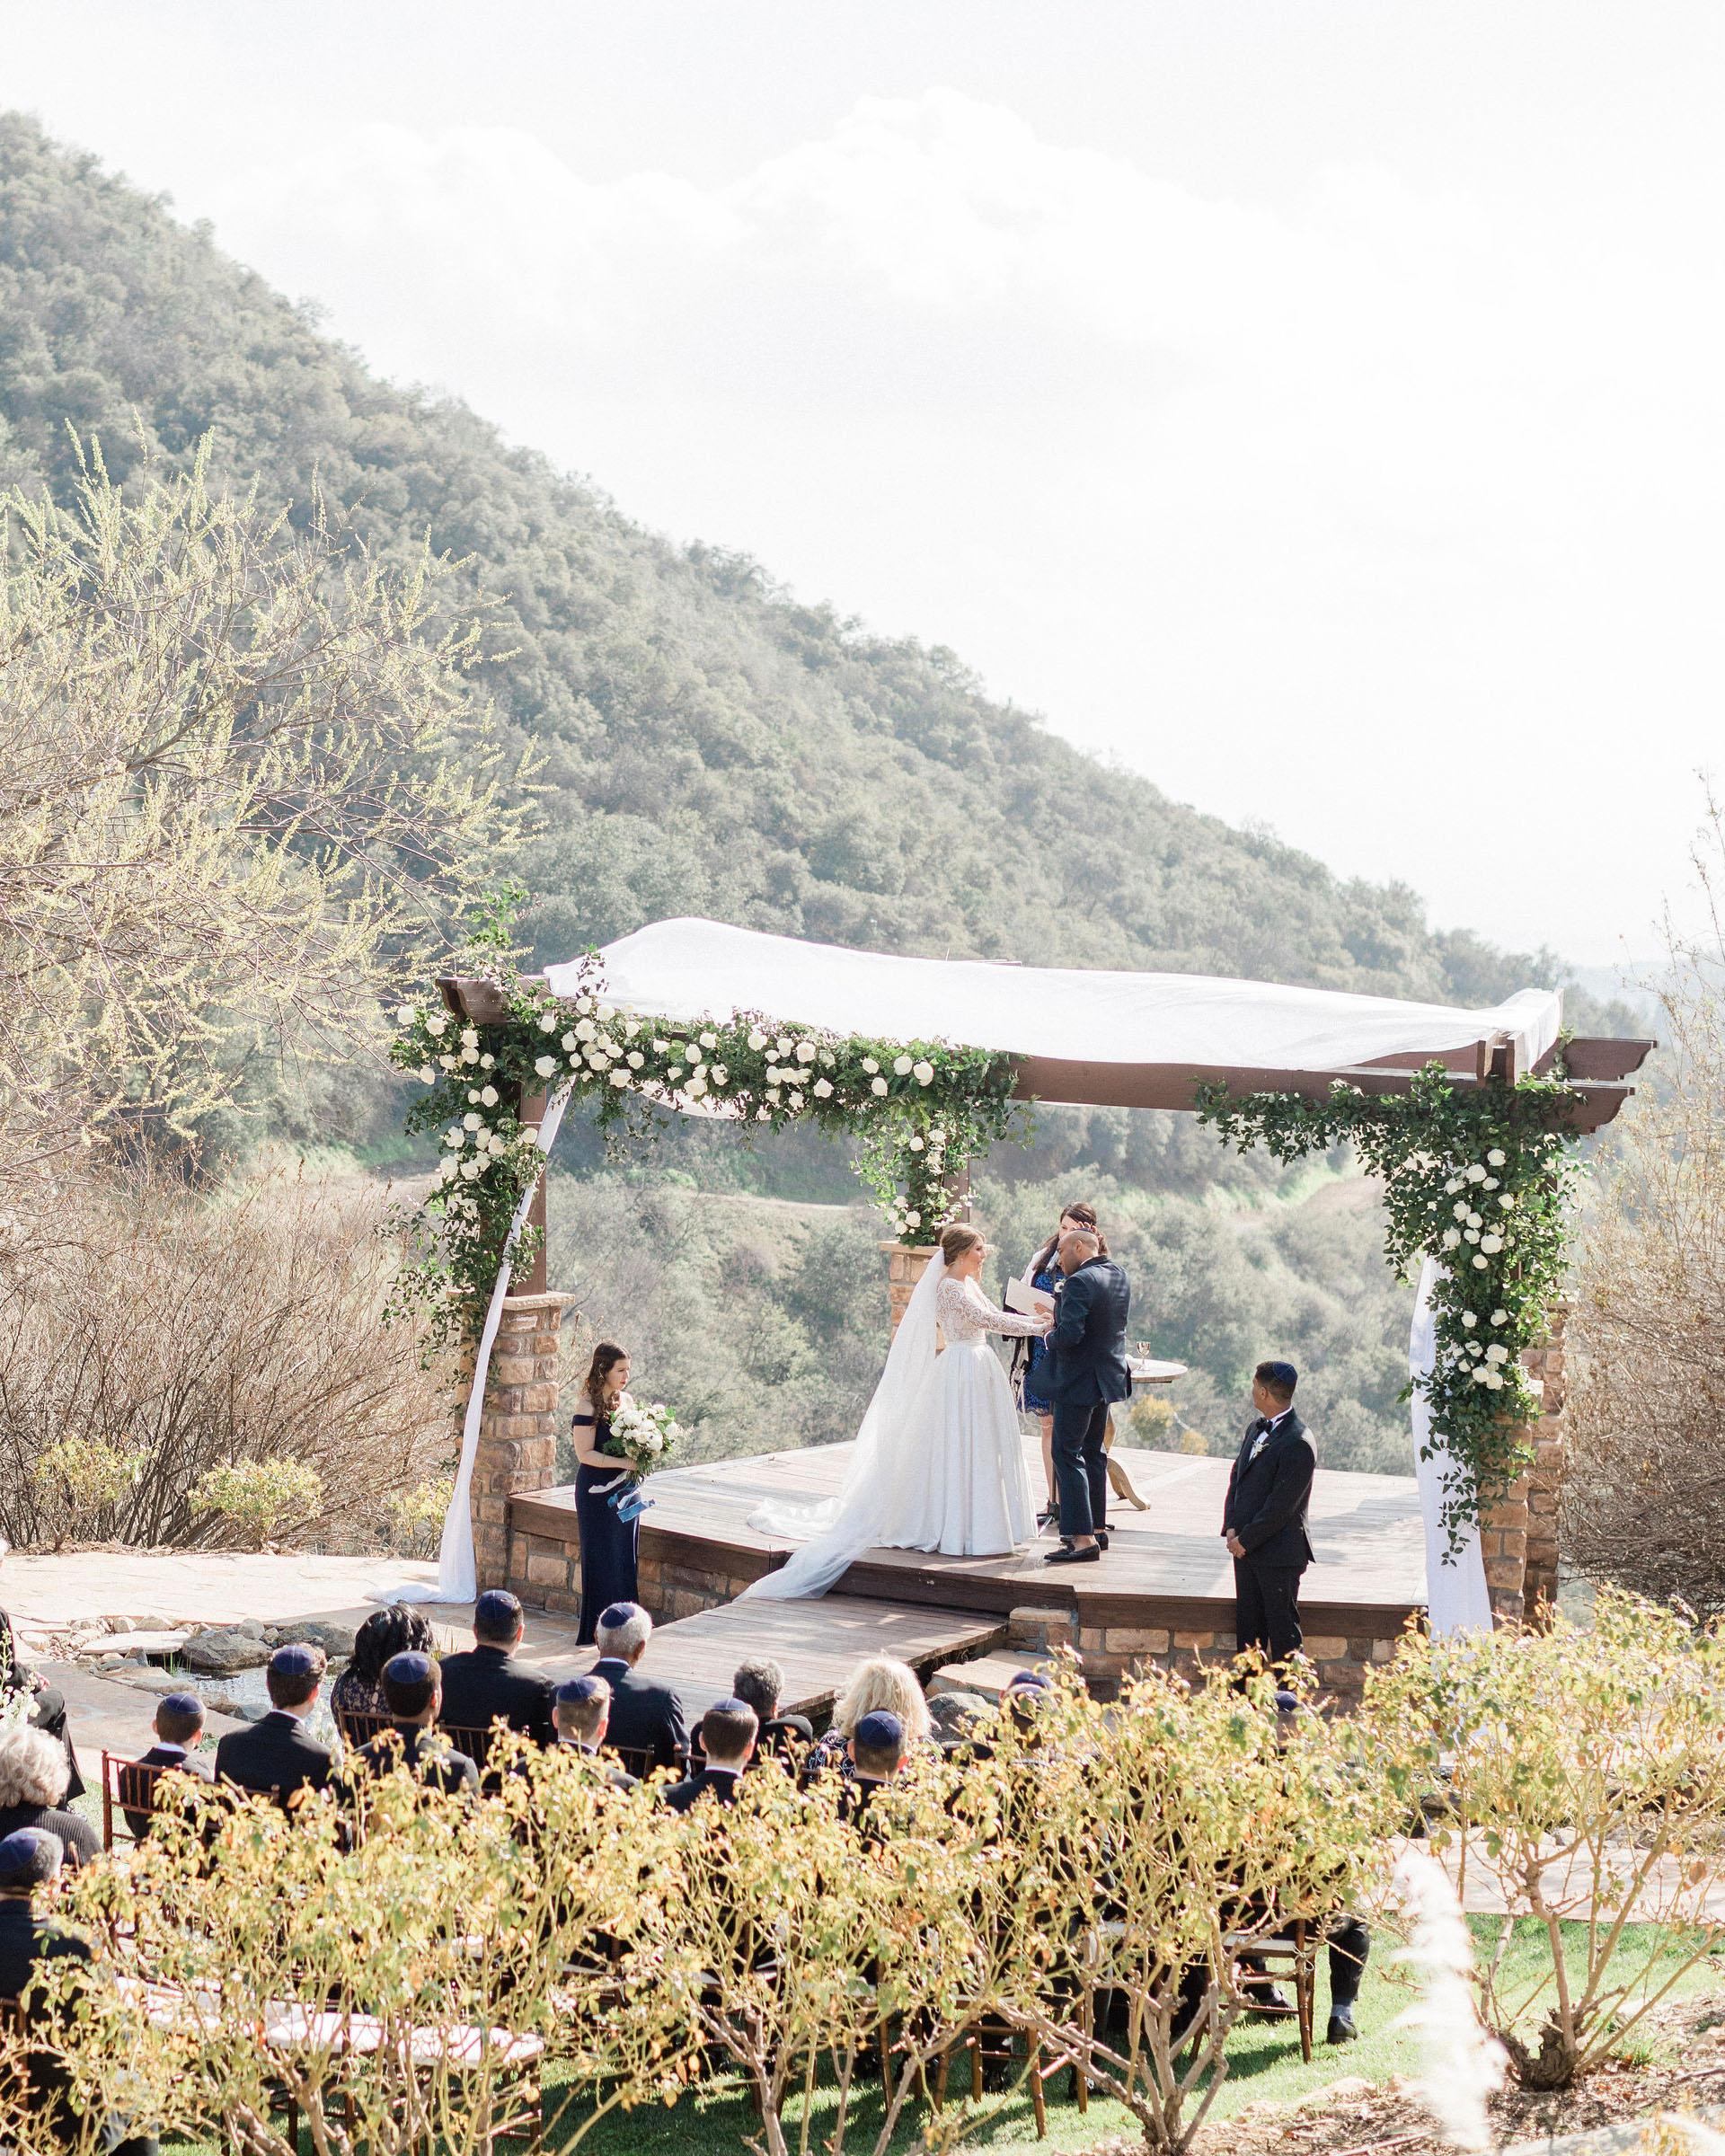 susie joe wedding ceremony at altar